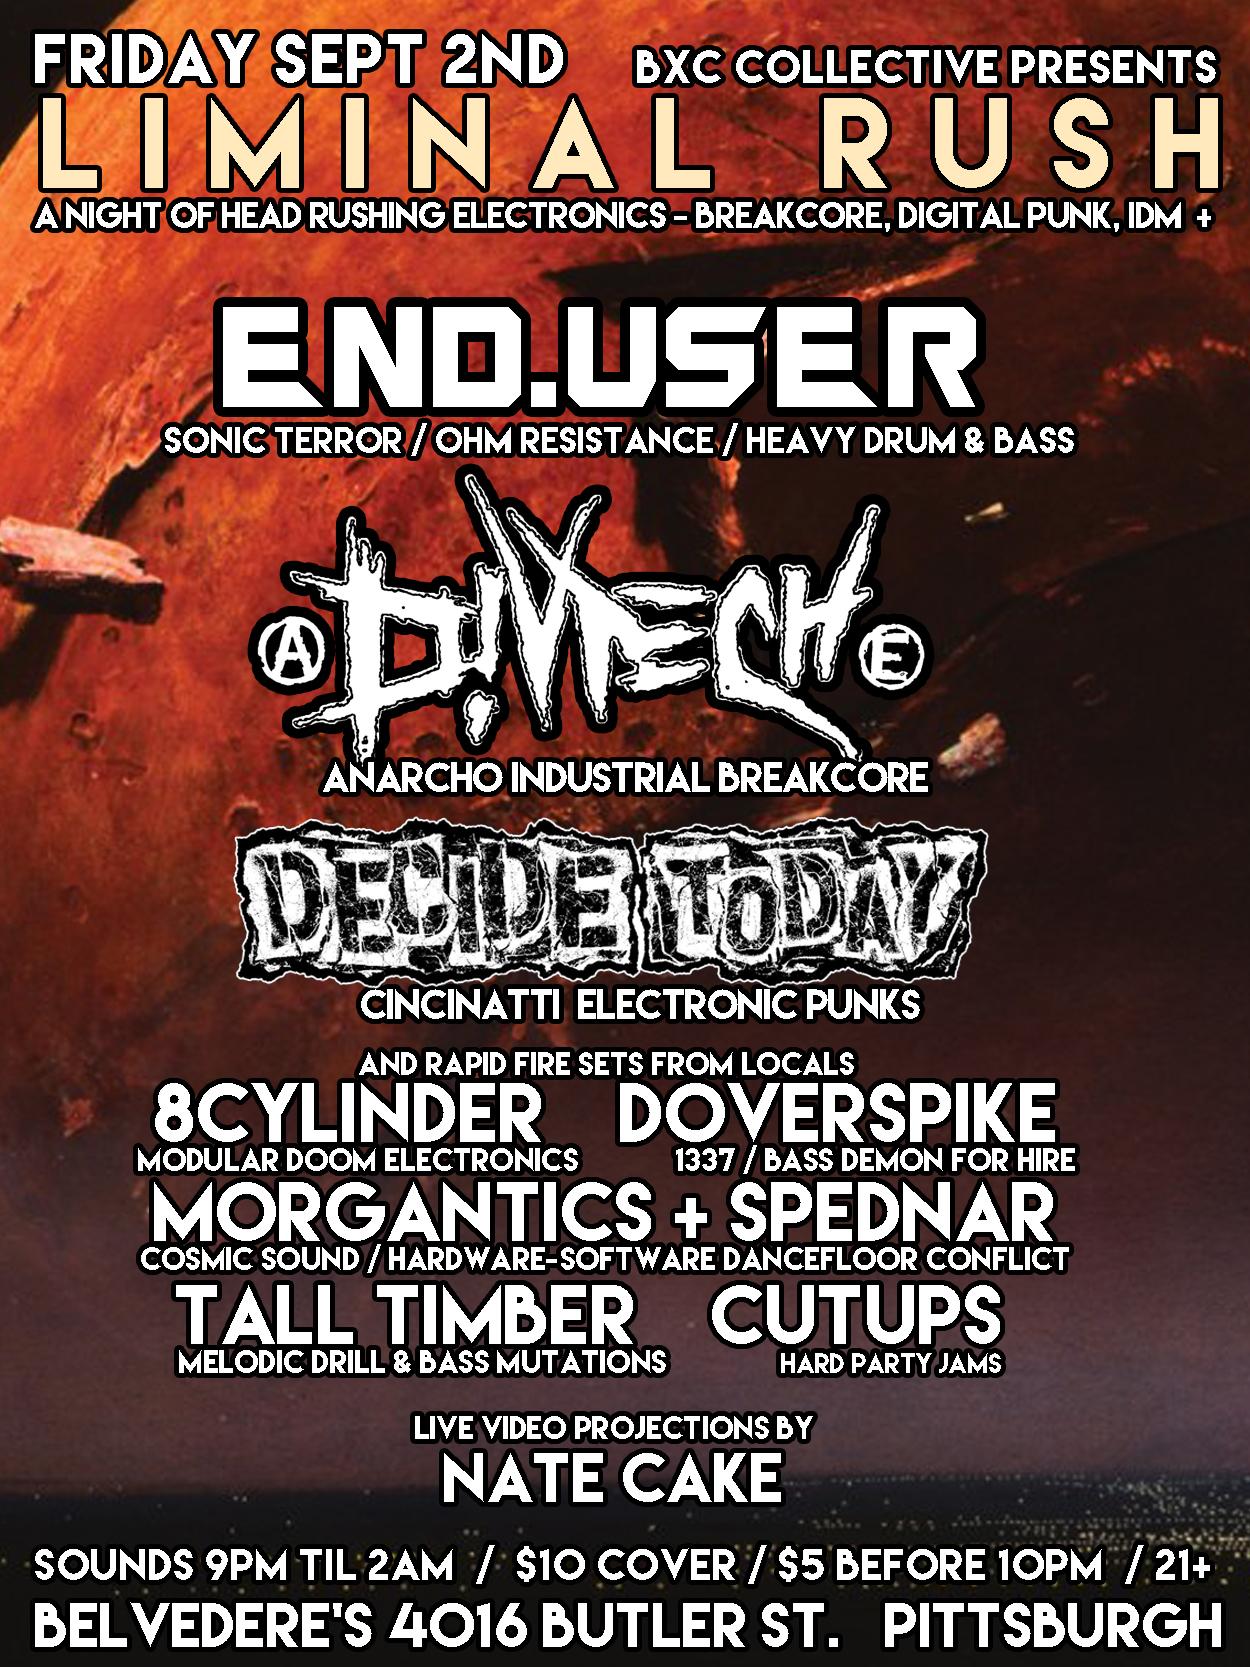 Fri Sep 2nd LIMINAL RUSH w/ Enduser, Divtech, Decide Today +++ [breakcore / idm / party] @ Belvederes